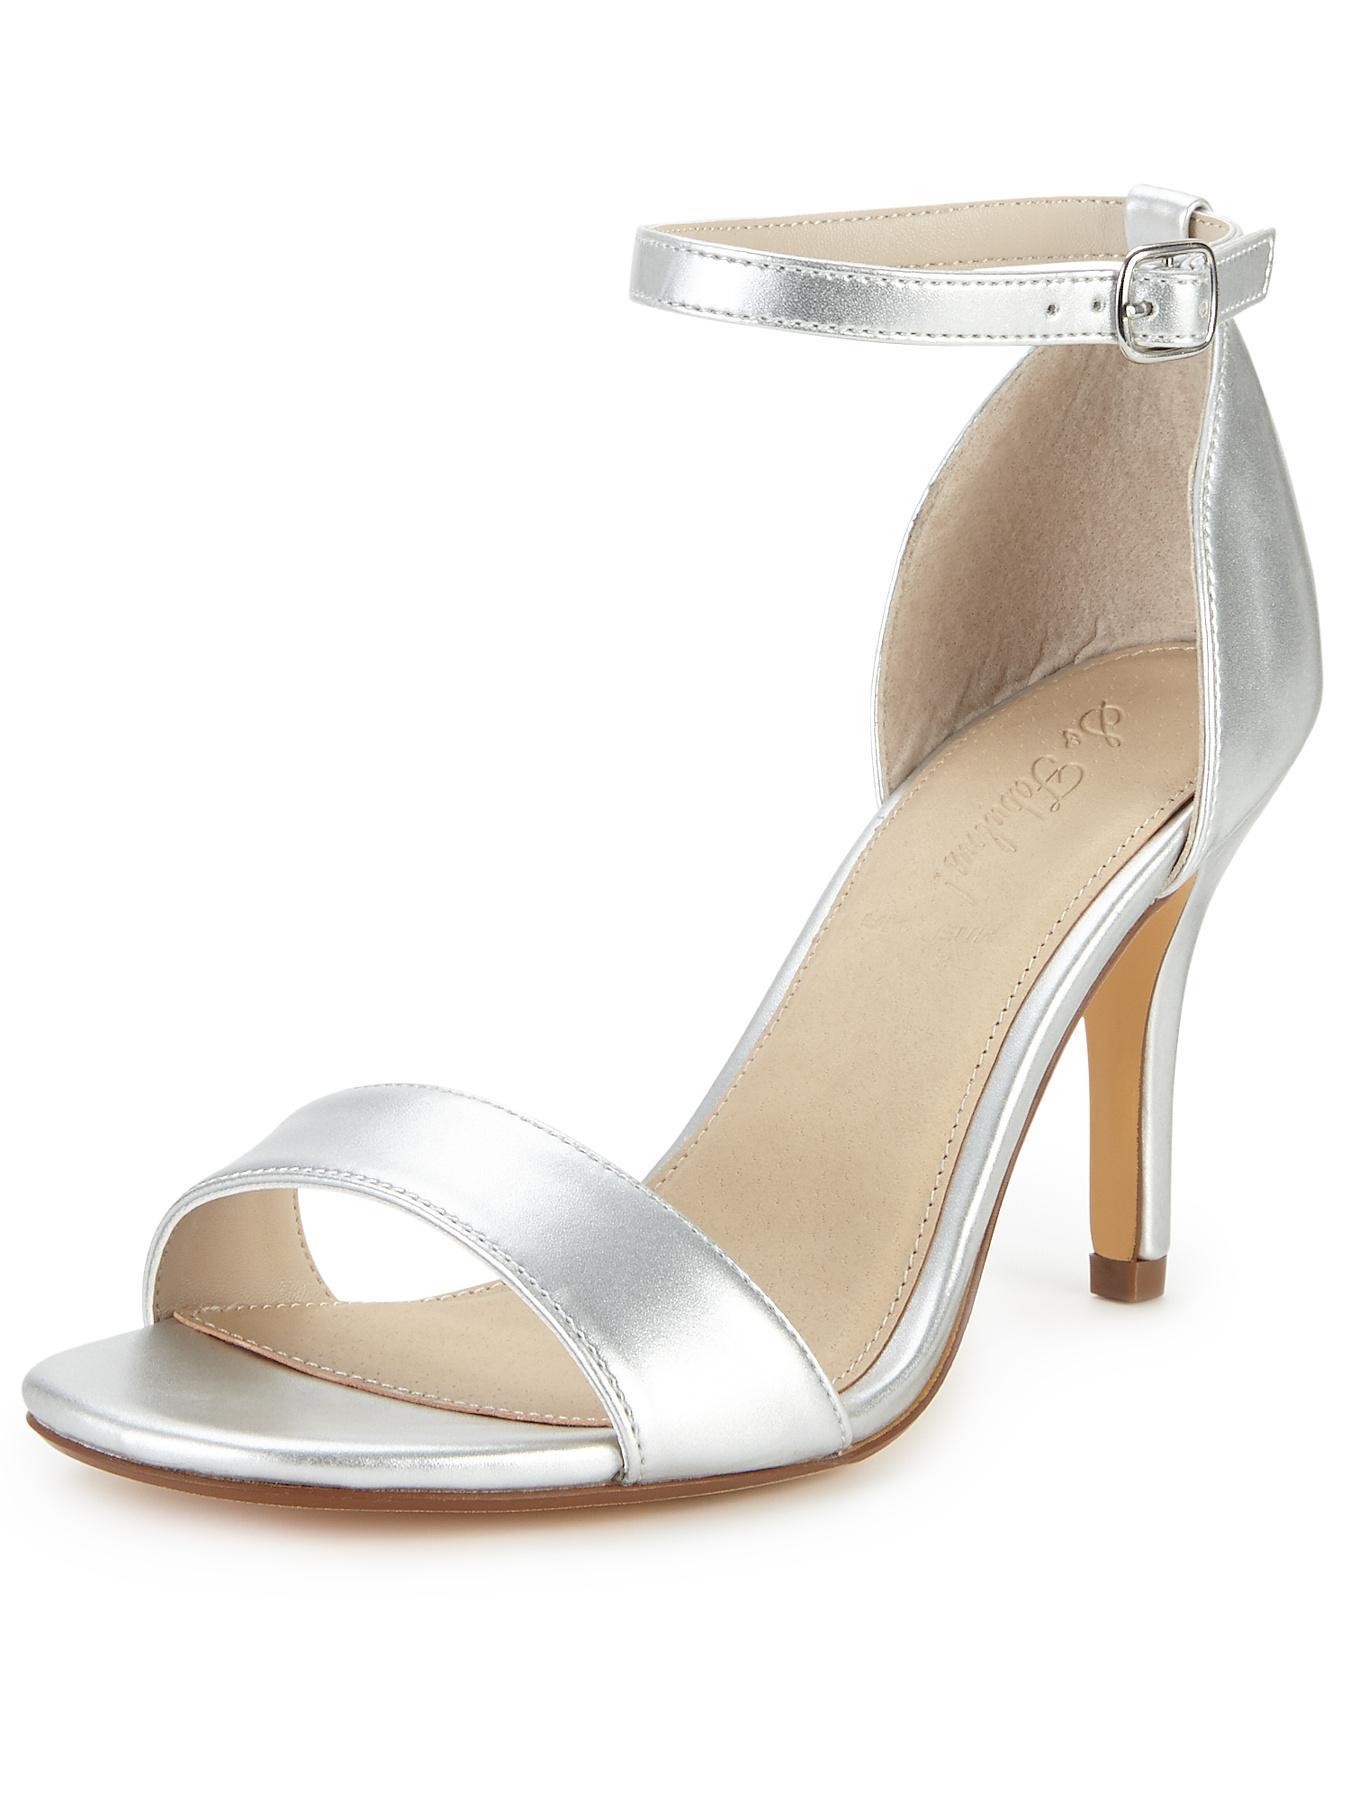 Silver Sandal Heel